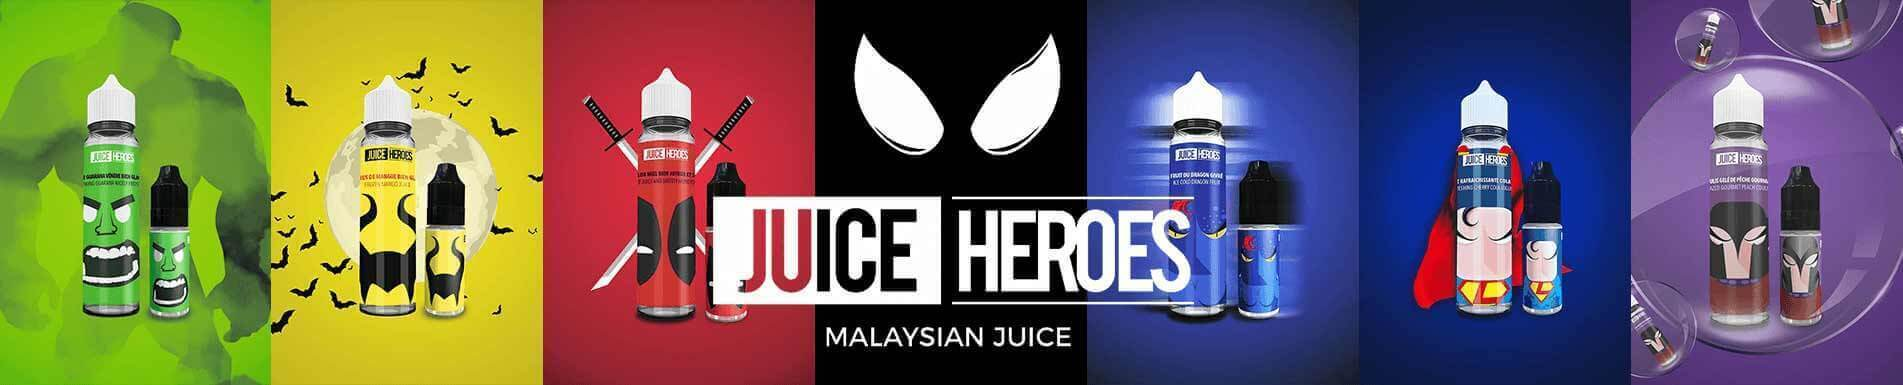 e-liquide juice heroes